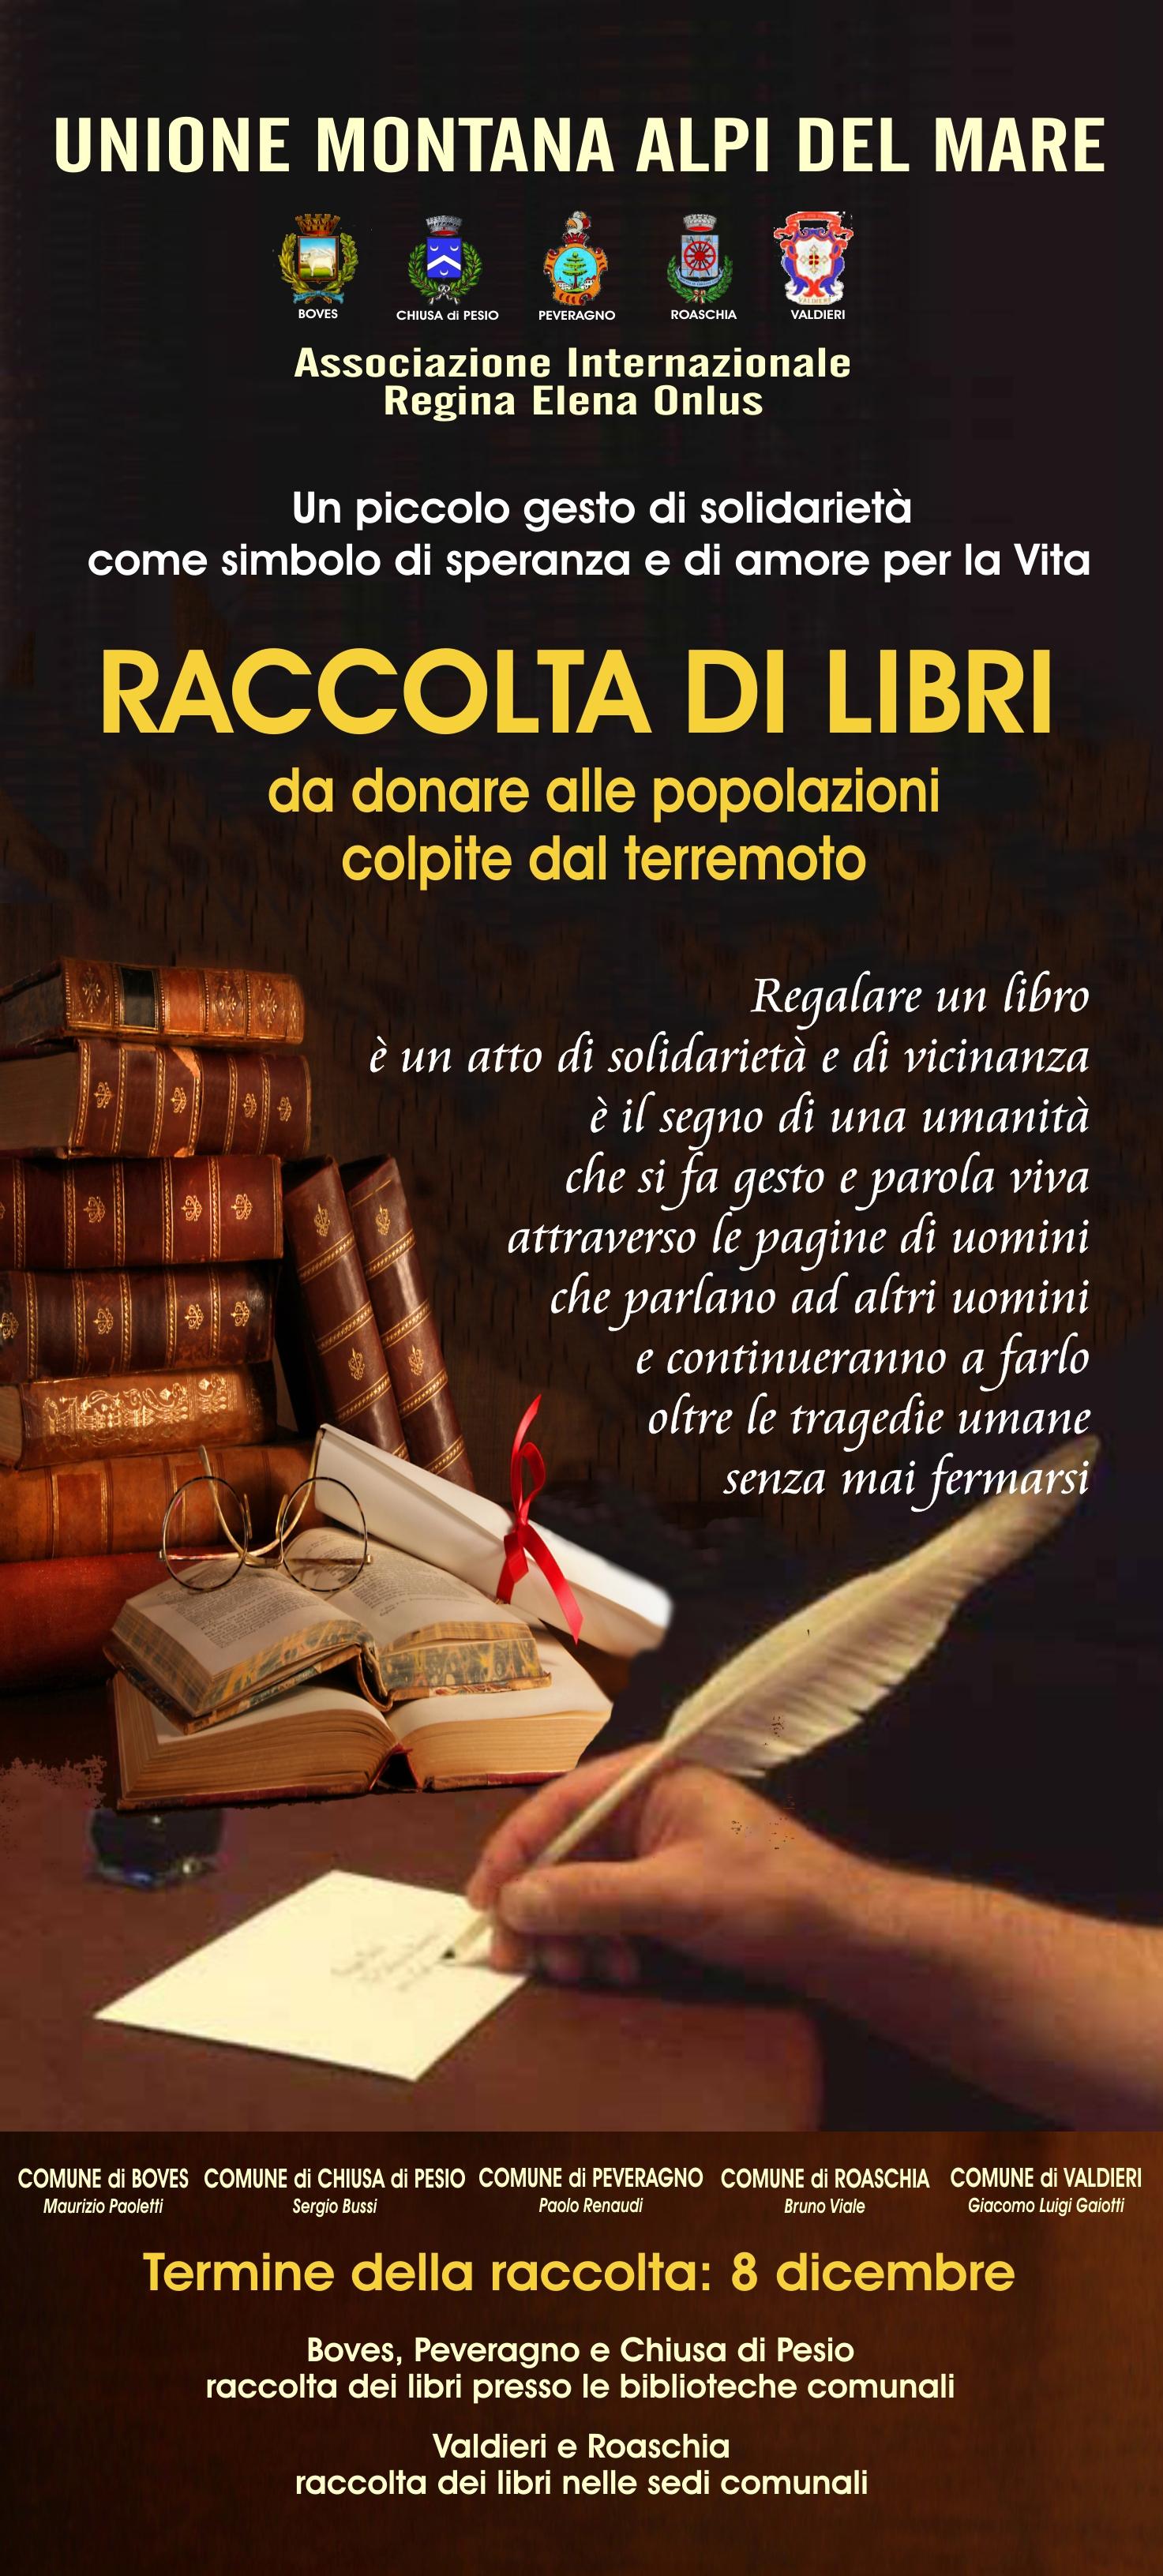 terremoto-raccolta-libri